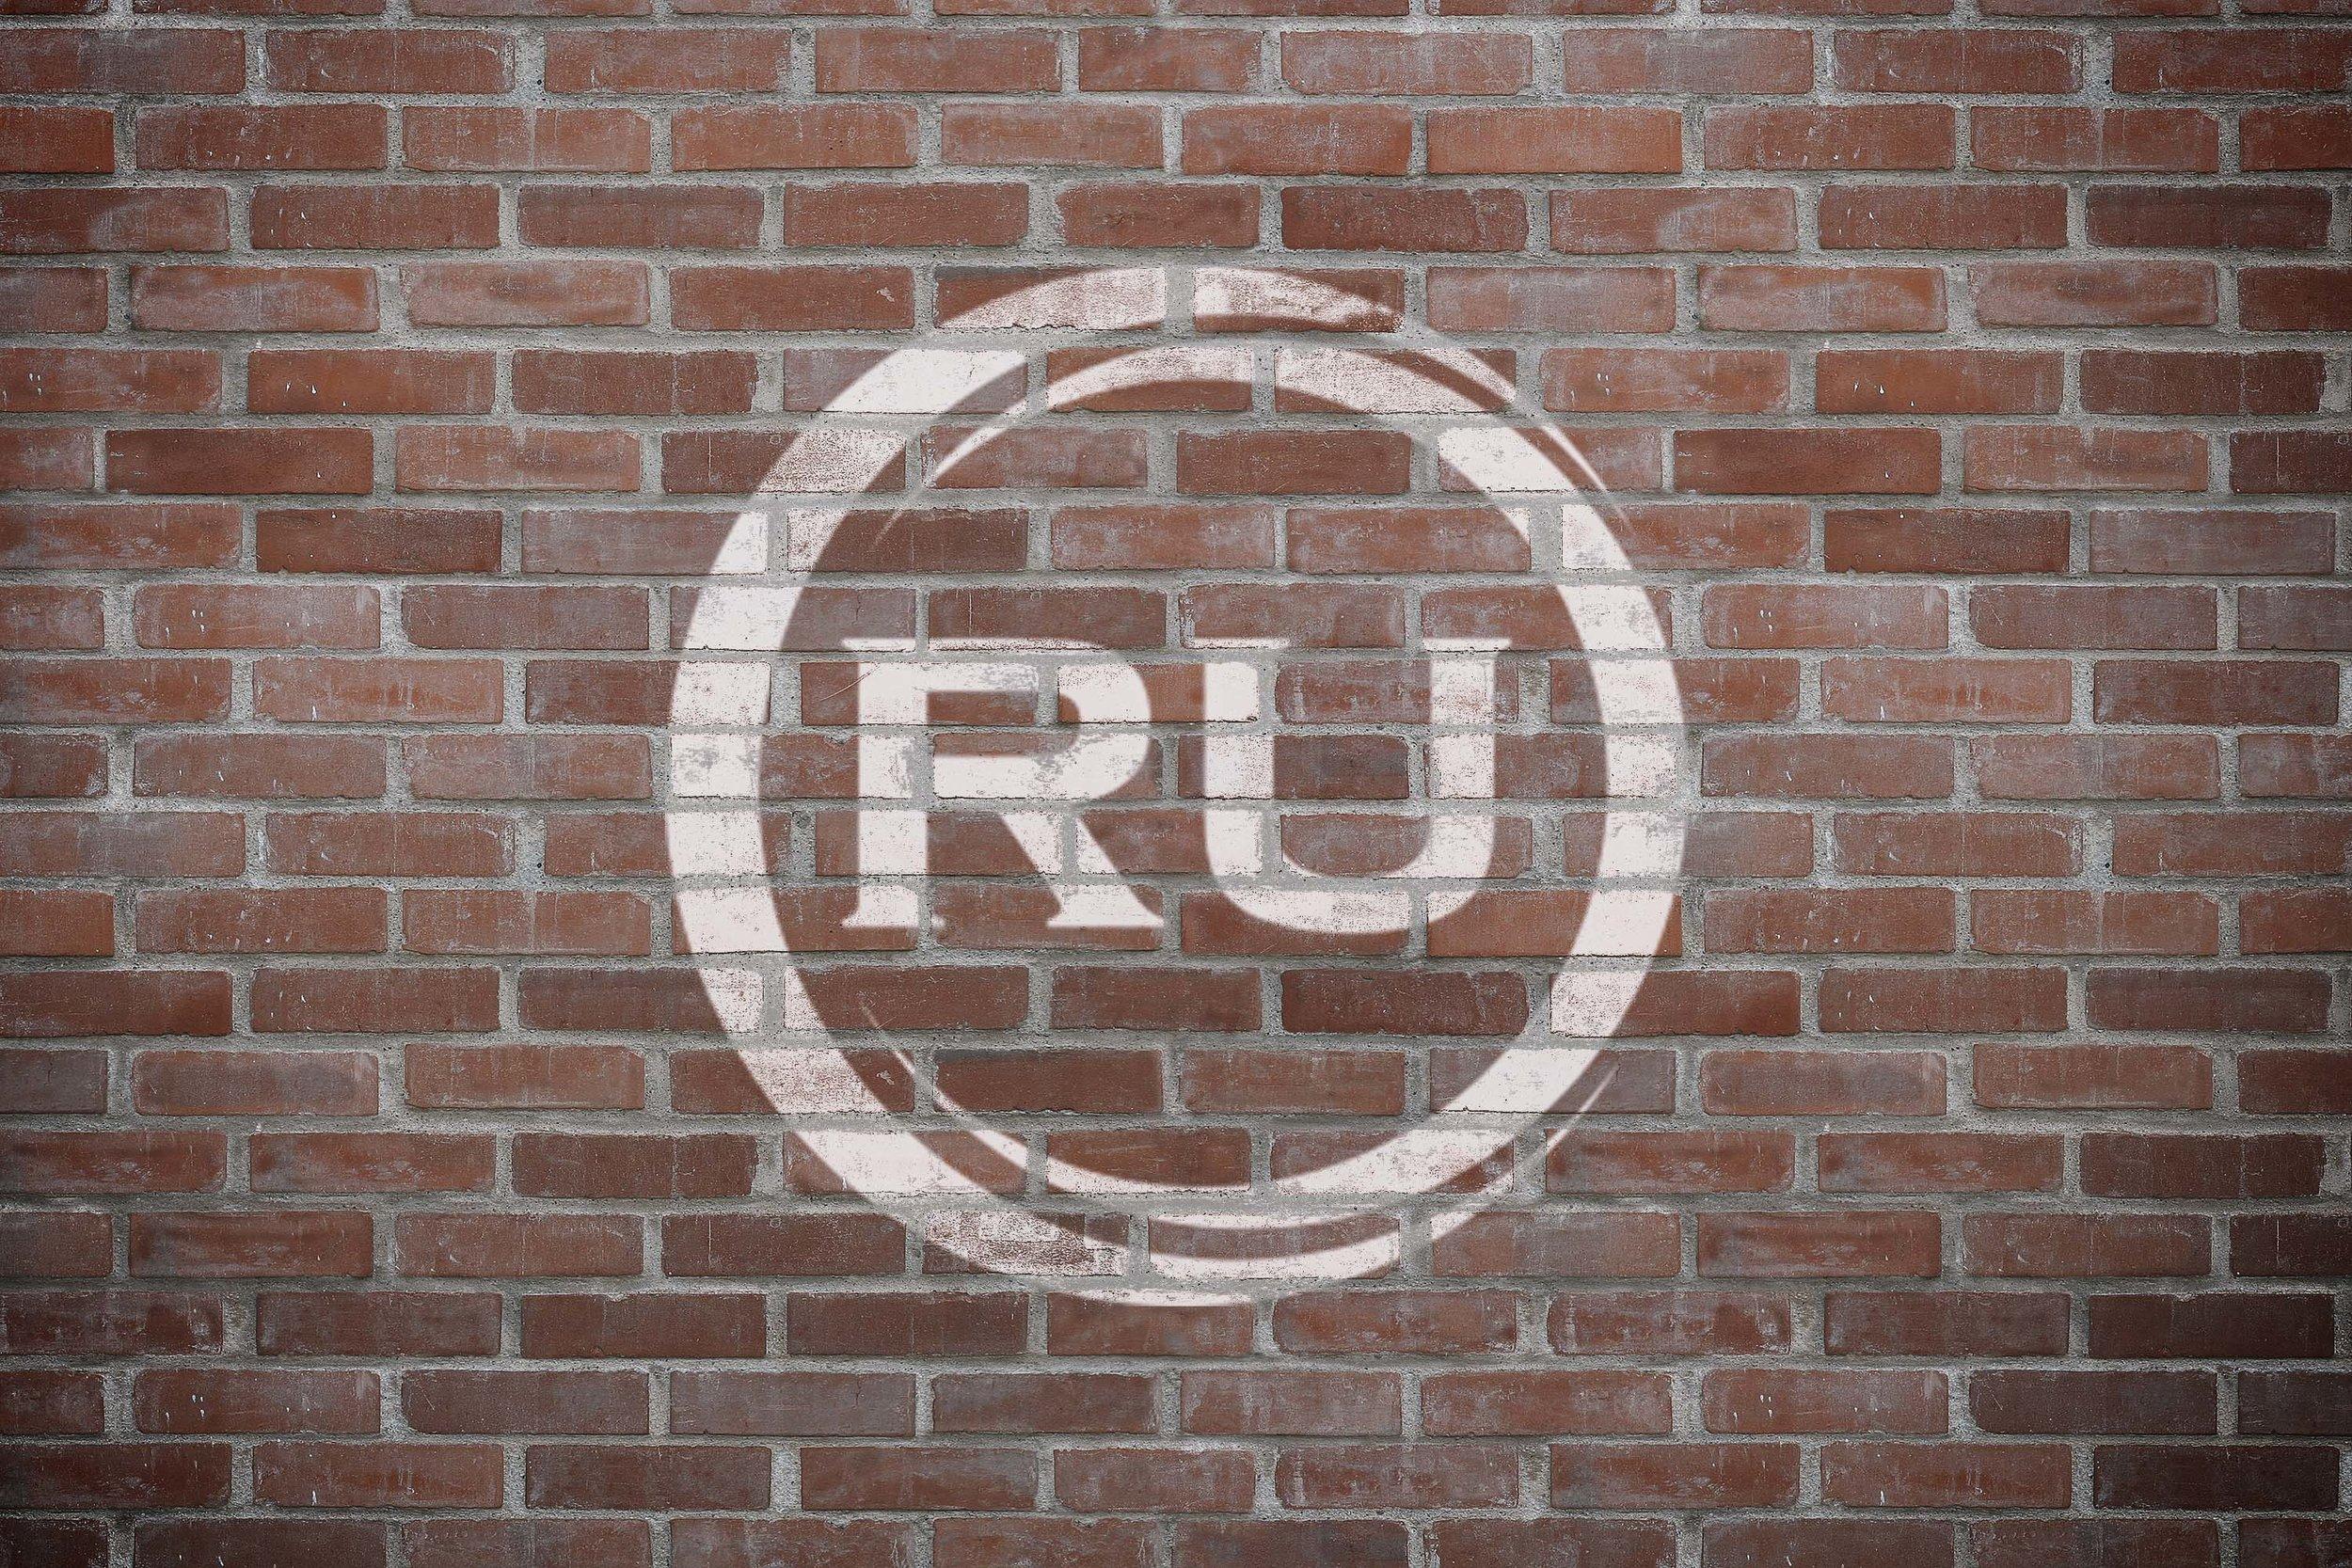 brick-wall-mockup-02.jpg